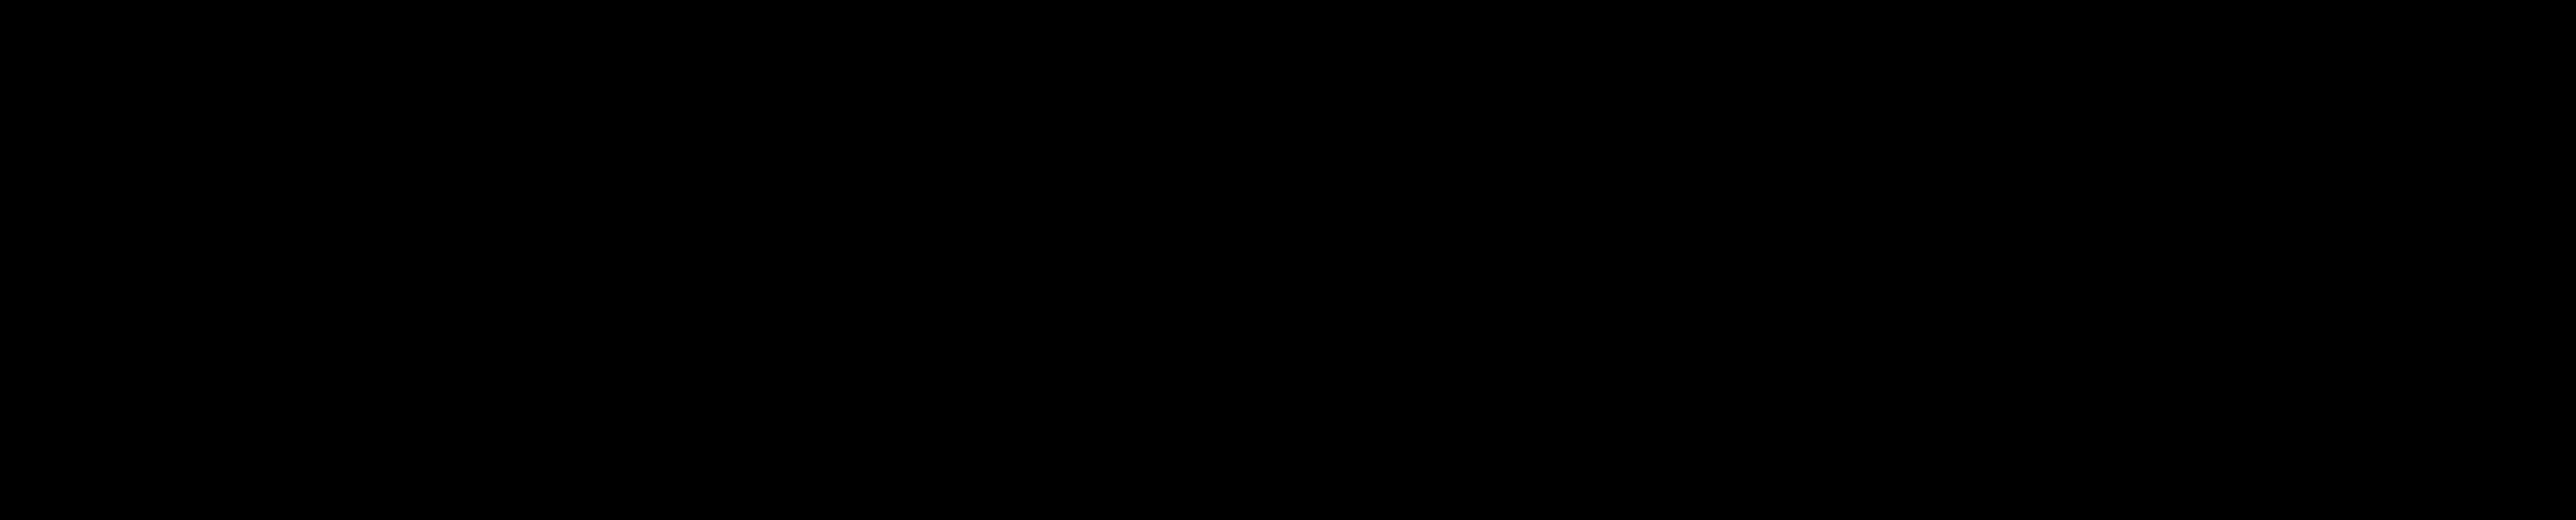 Satire/jokerumored Amd Vega Logo Clipart.